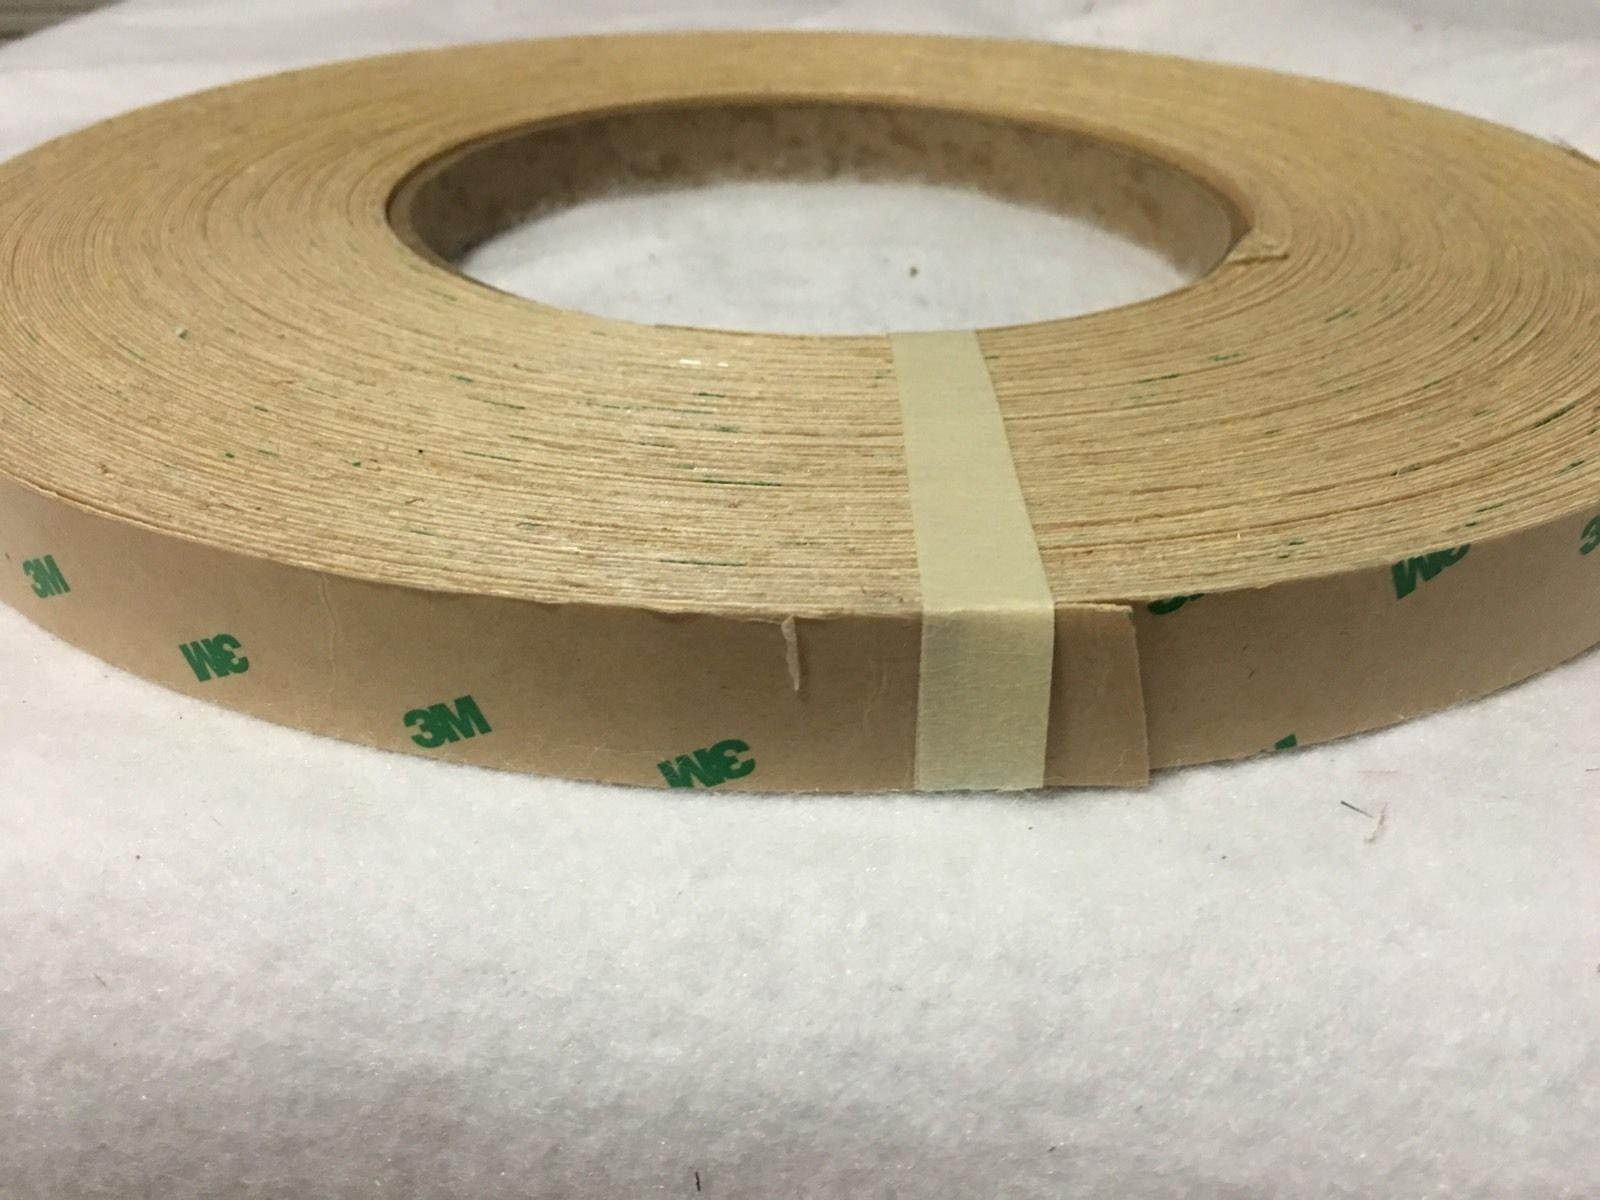 Walnut peel and stick 3/4''x50' Wood veneer edge banding (3m) PSA by (3m) PSA